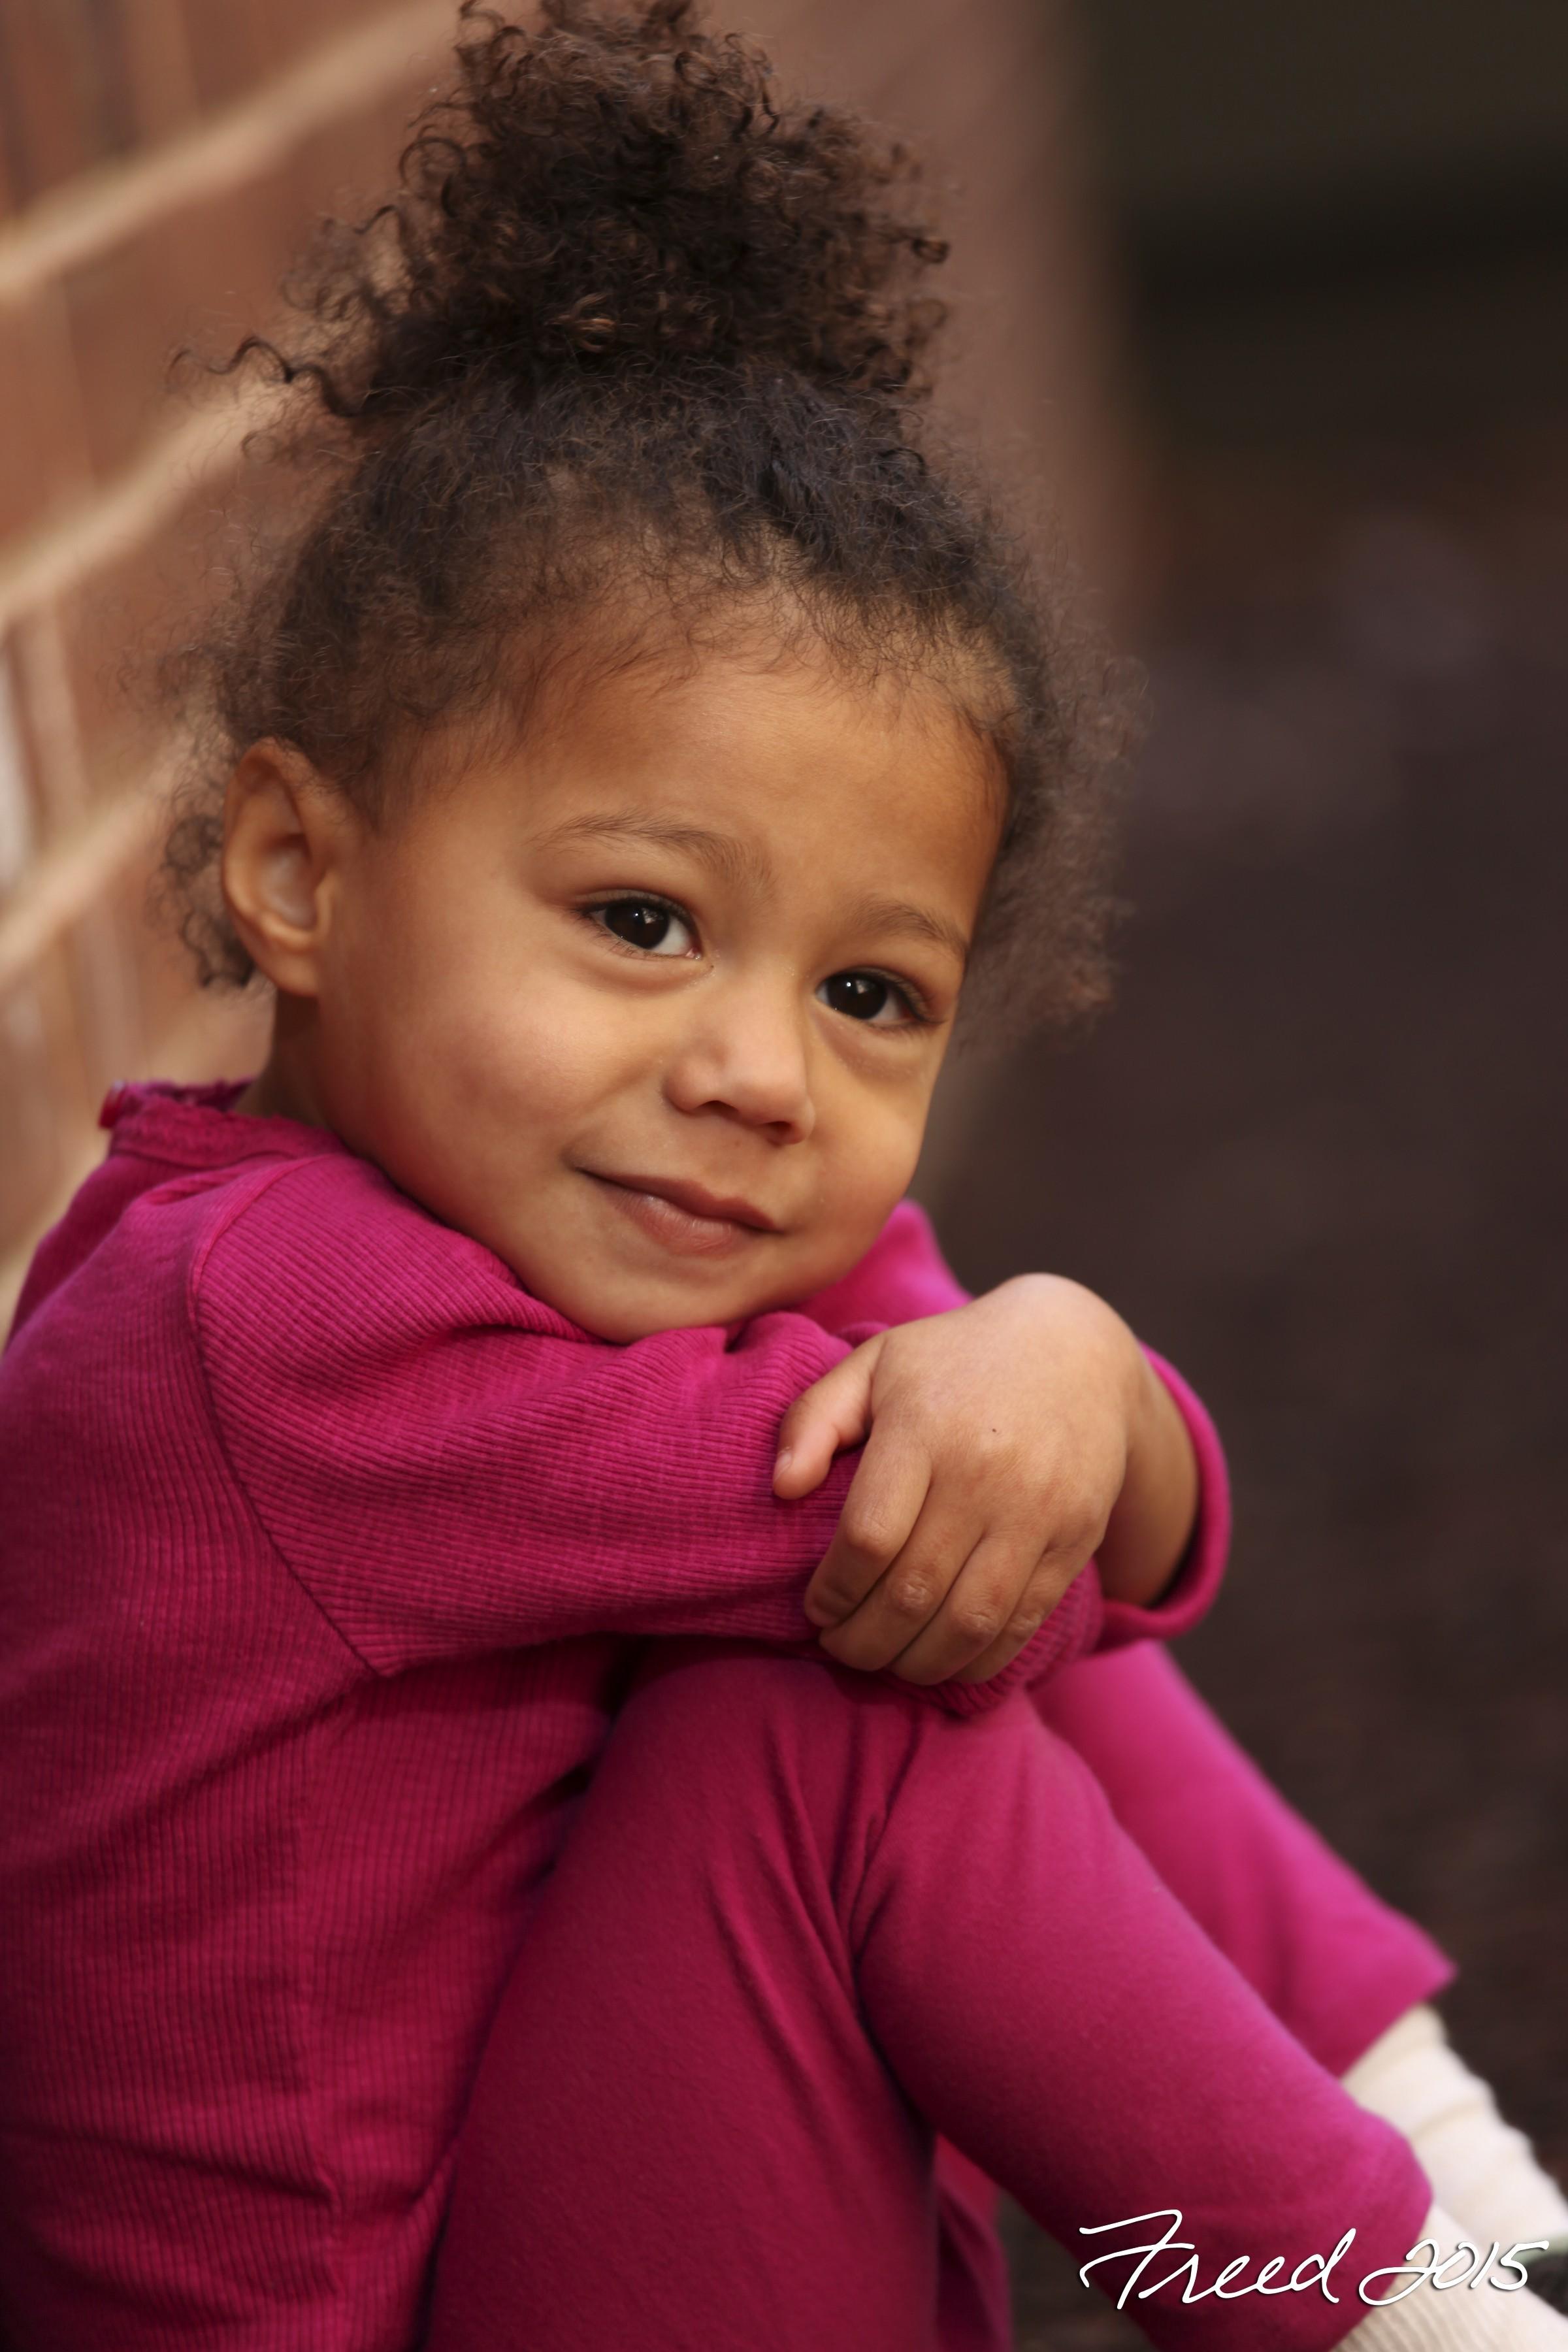 The Blog City Girl Educate Advocate Titillate Free Patterns My Little Citygirl Roya Stef Woods Blogs